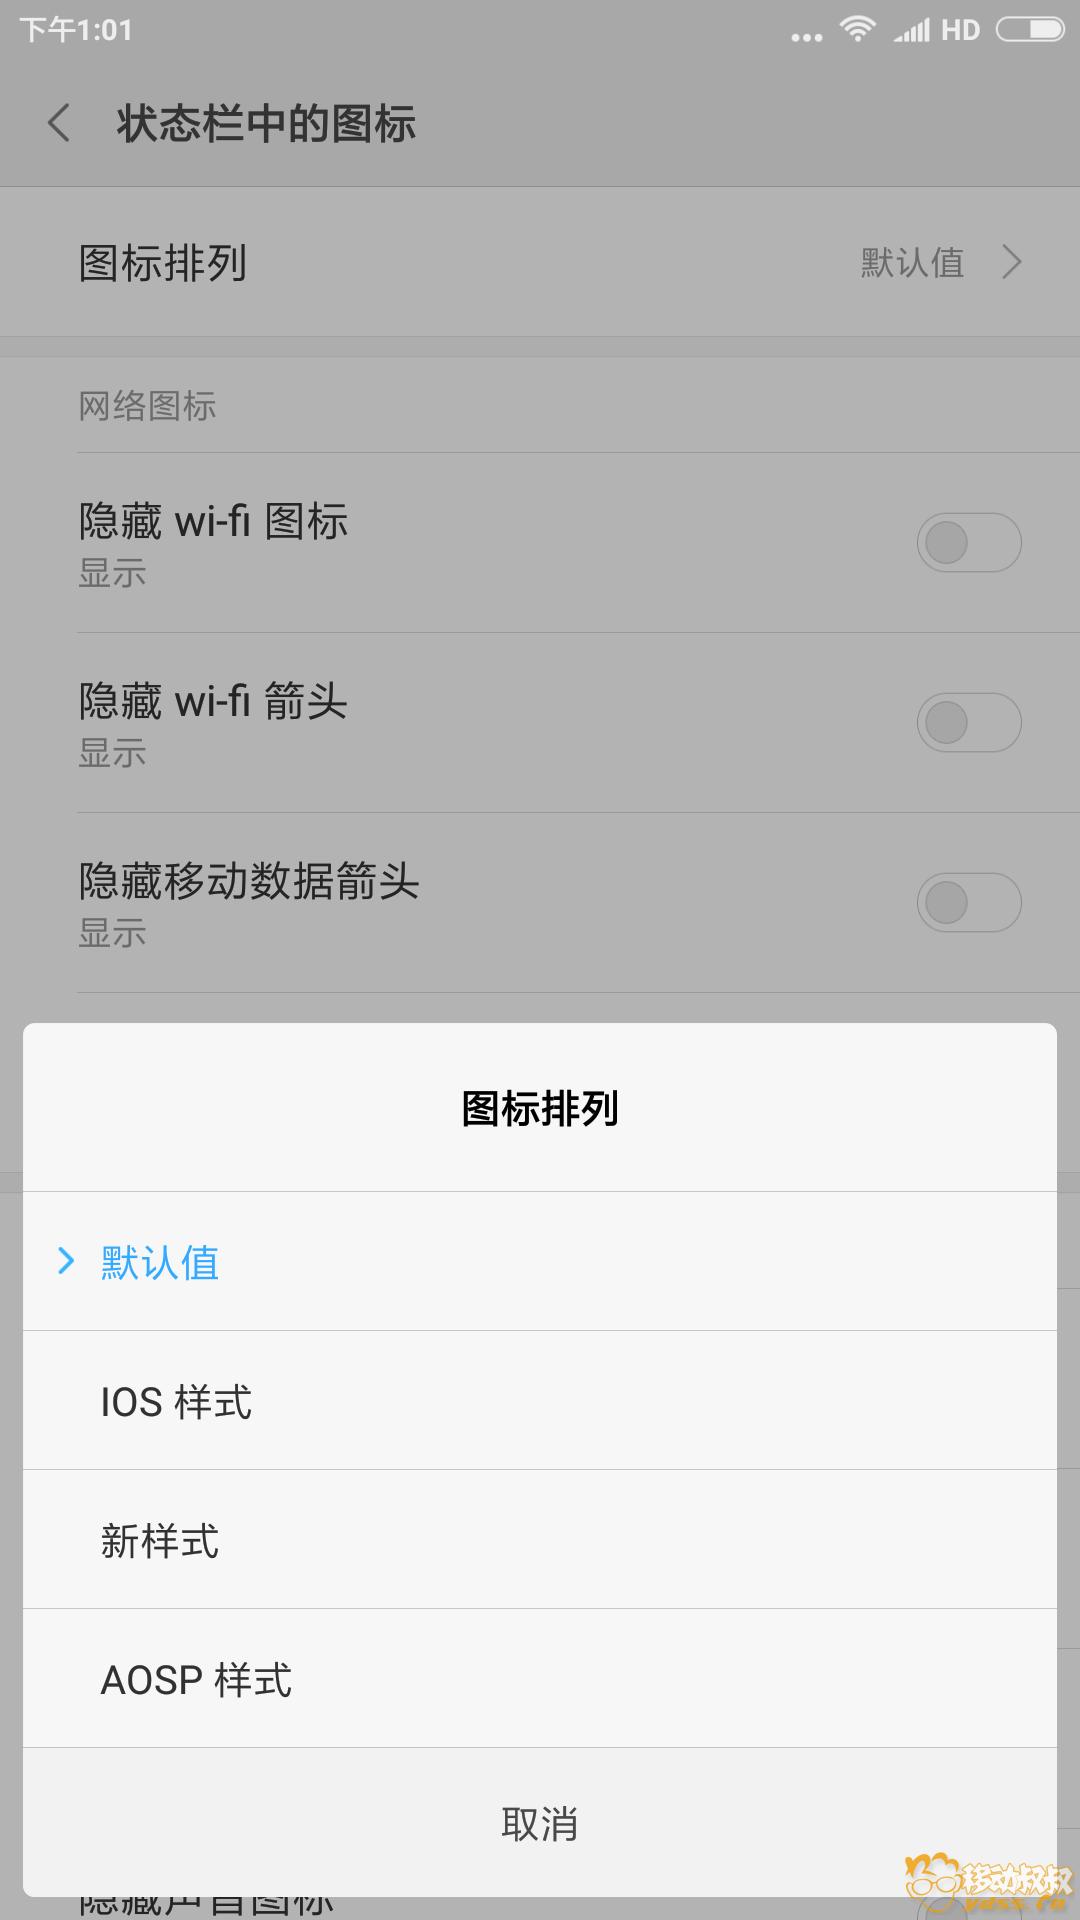 Screenshot_2018-04-04-13-01-31-910_com.android.se.png